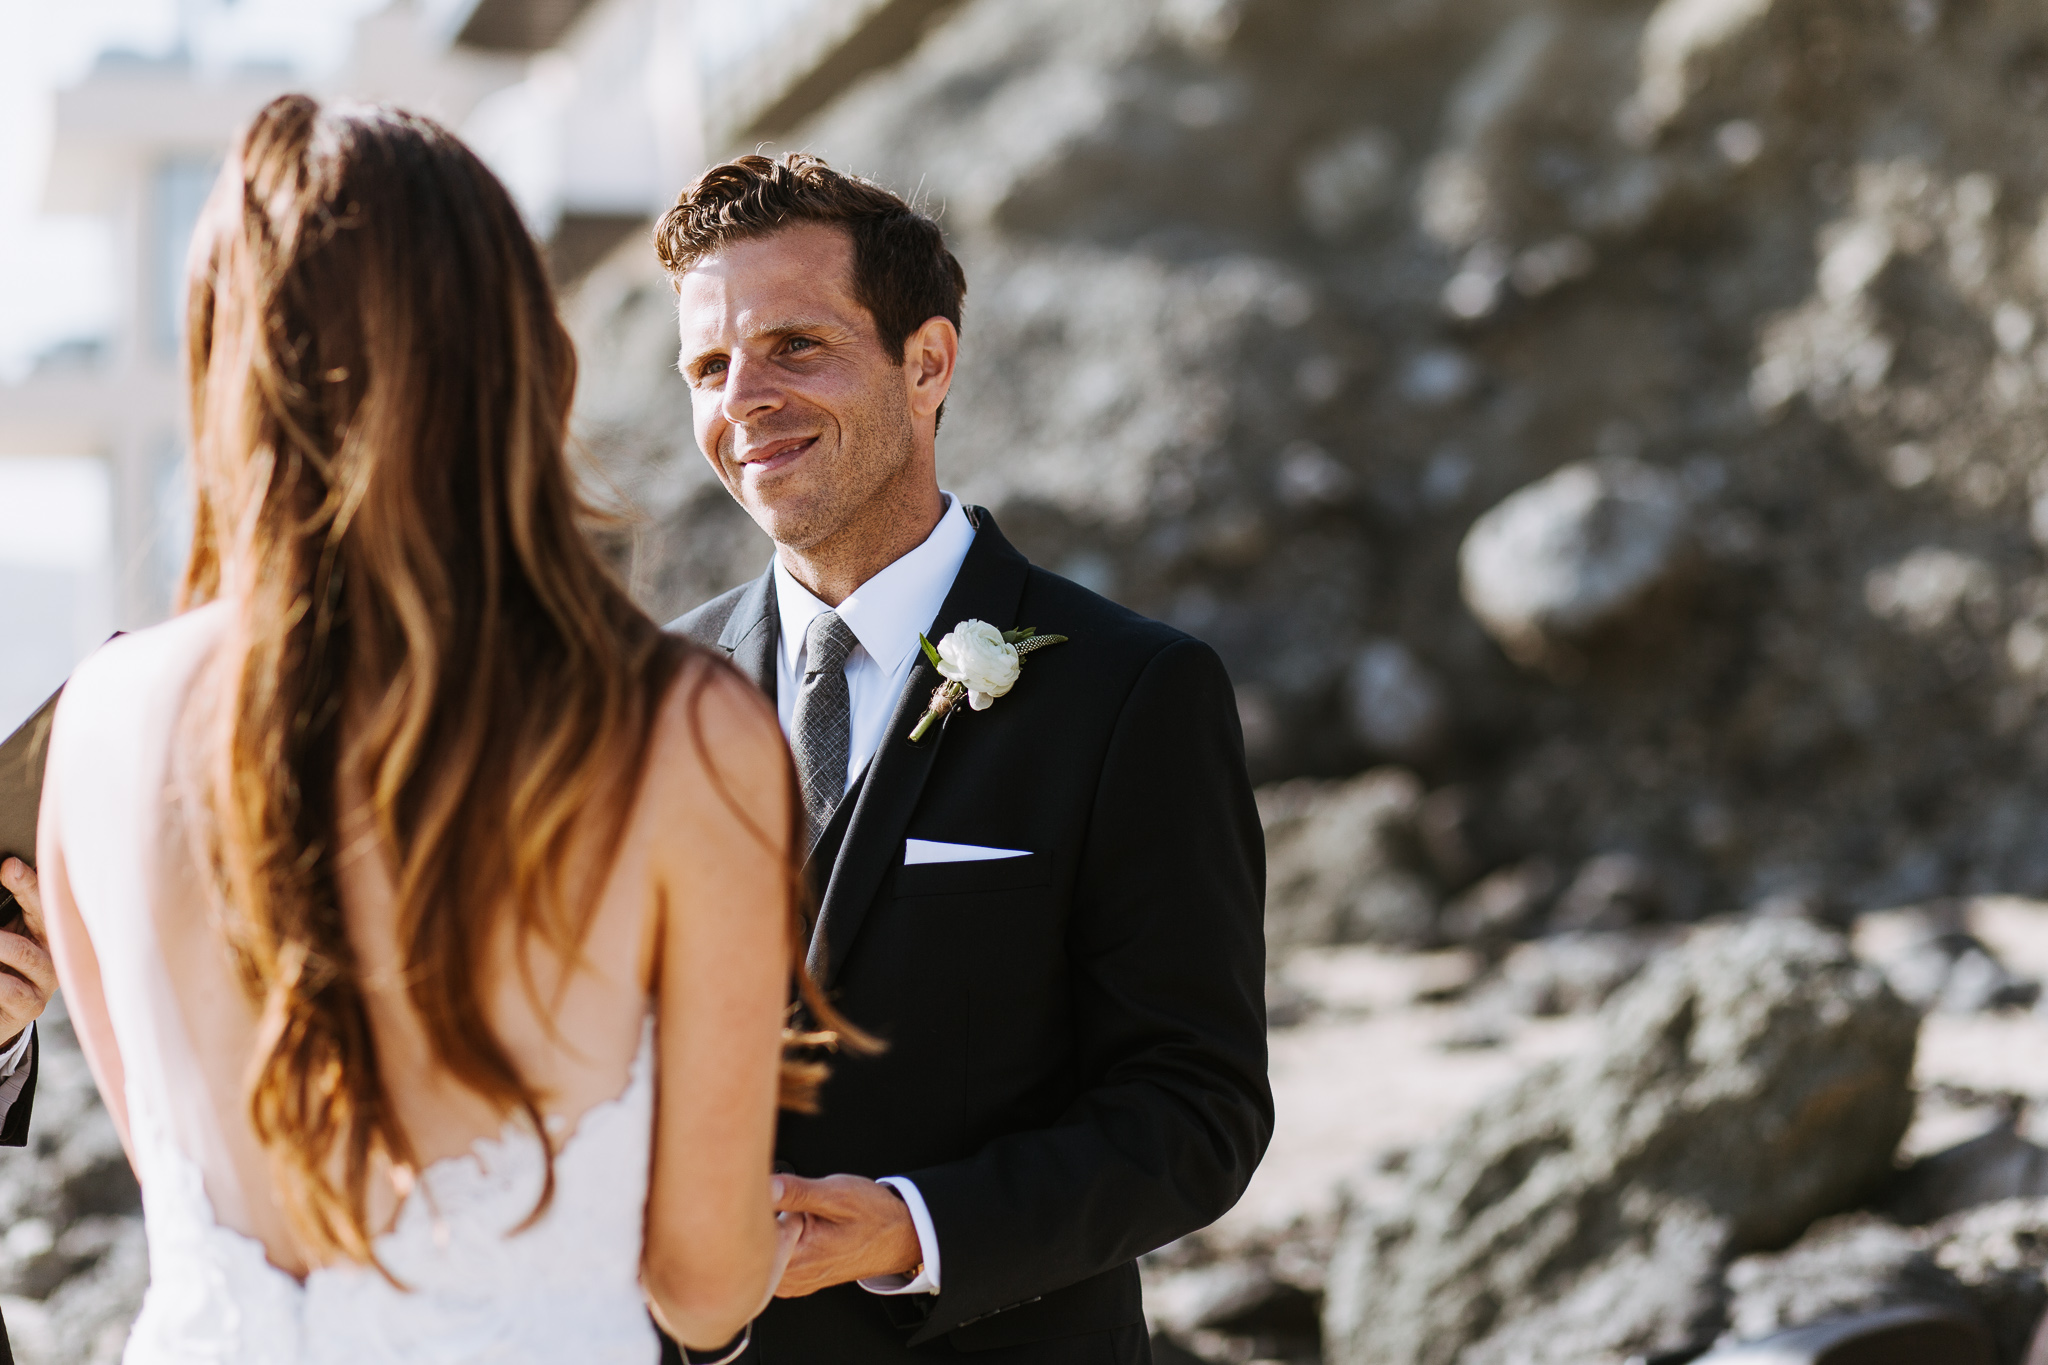 LagunaBeach-WeddingPhotographer-37.jpg